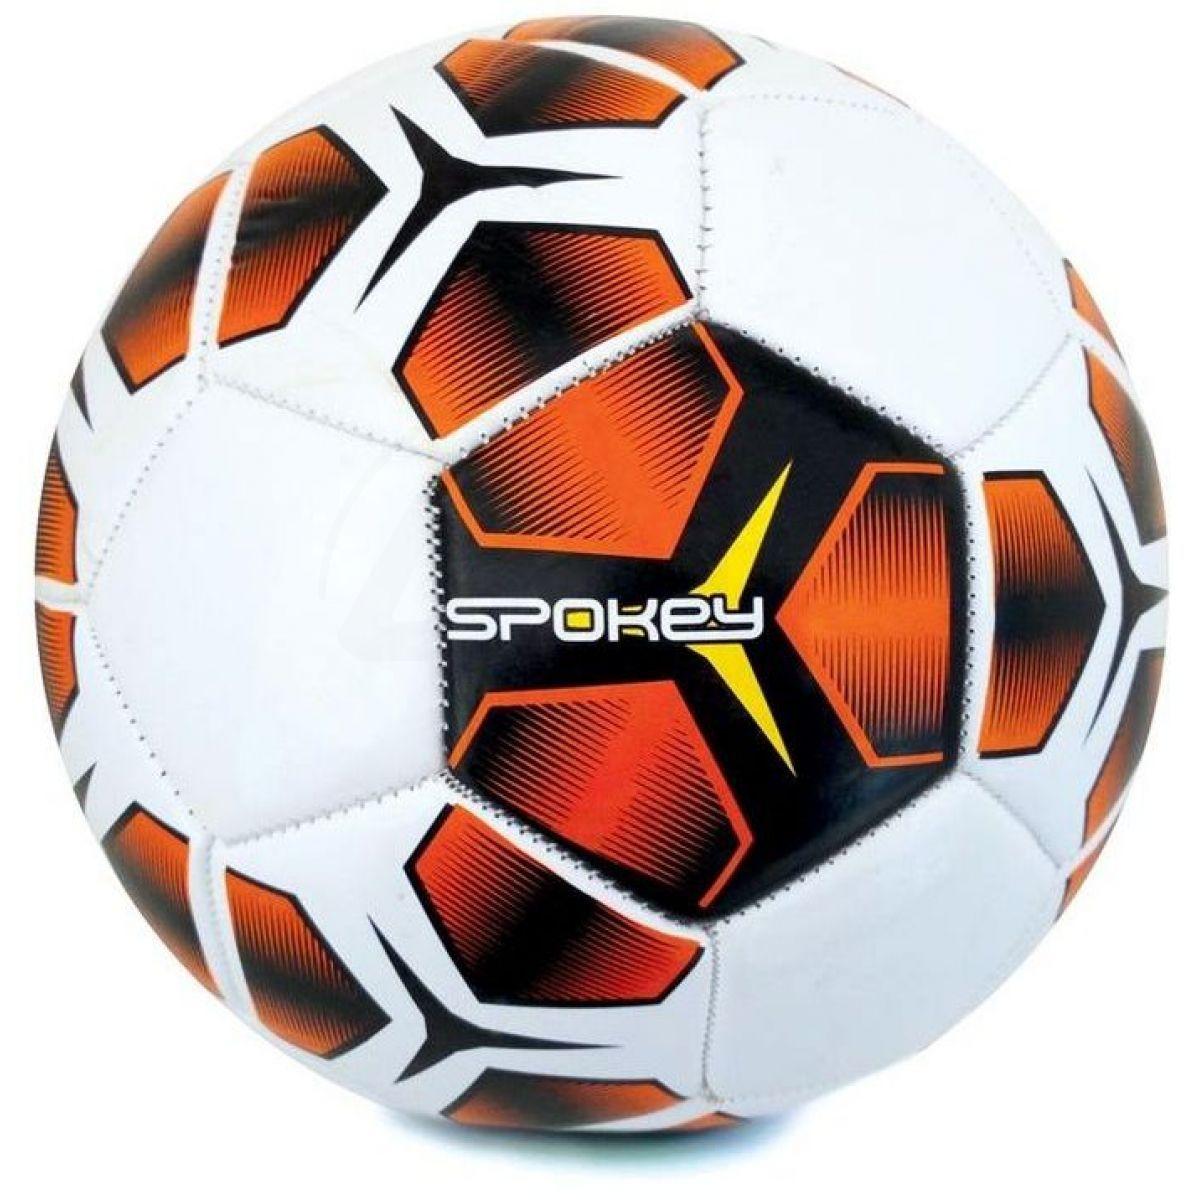 Spokey Haste fotbalový míč velikost 5 červenočerný